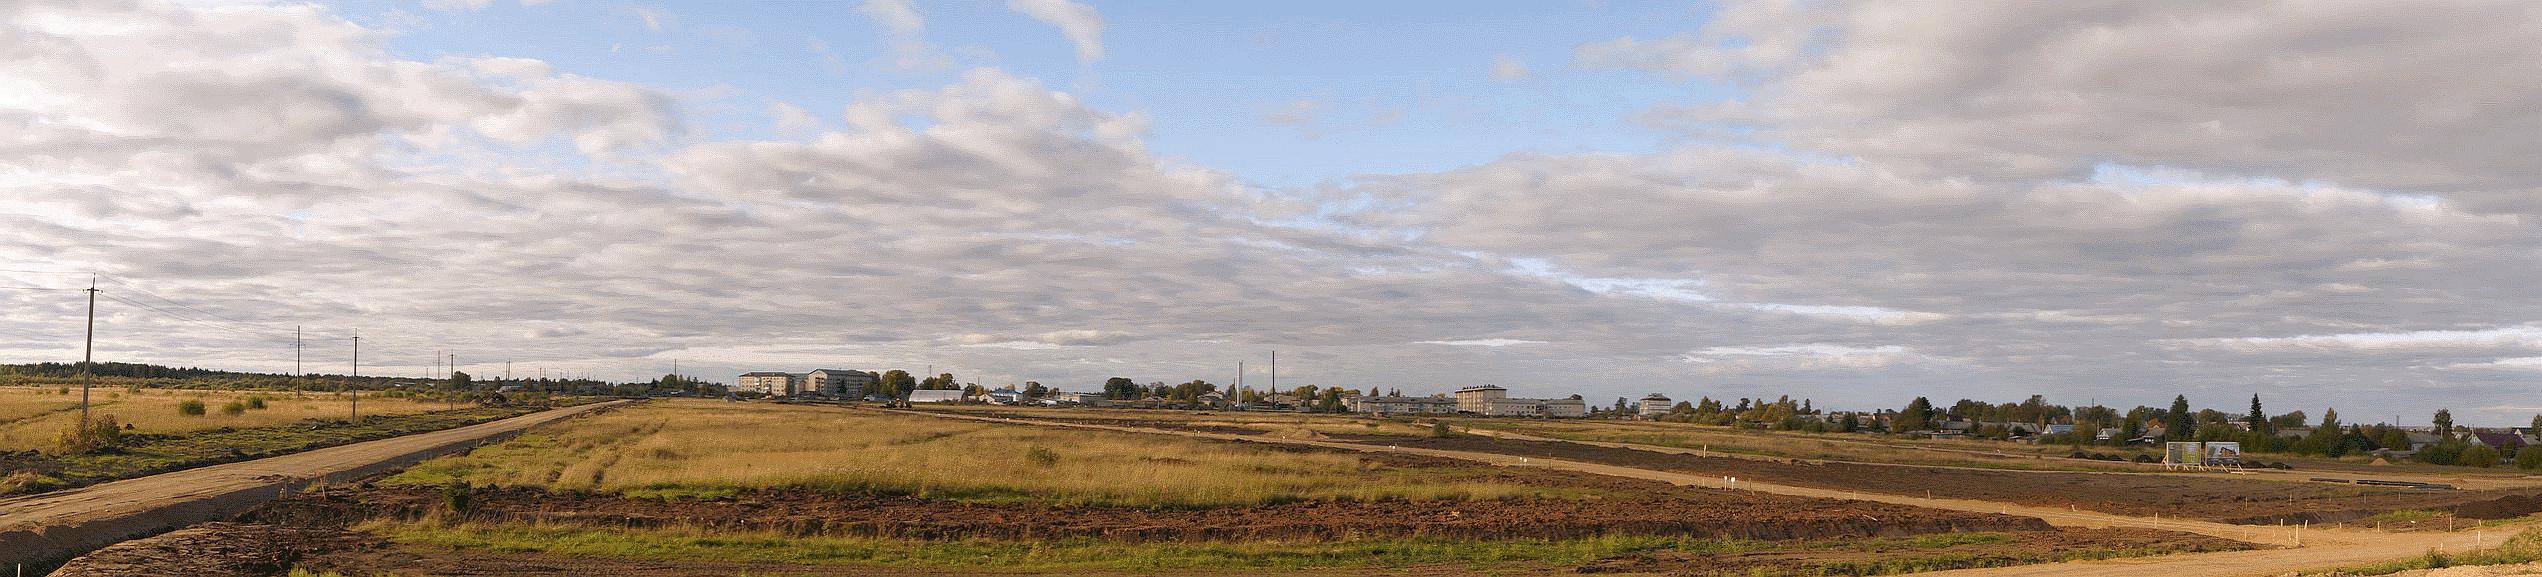 panorama-2-min